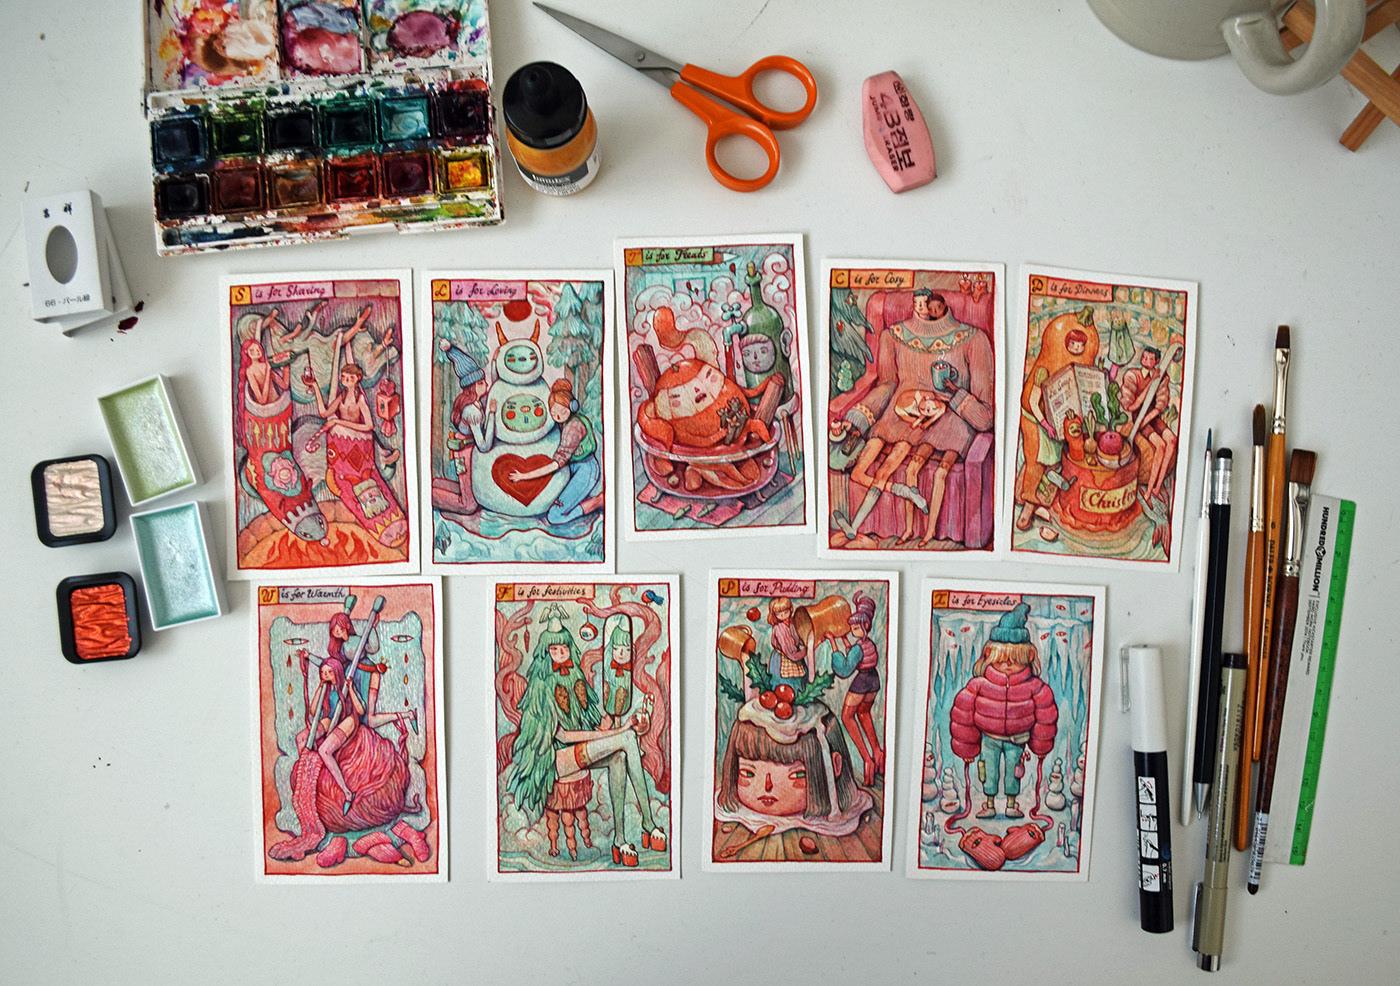 Make Winter Weird Again - a set of festive watercolors